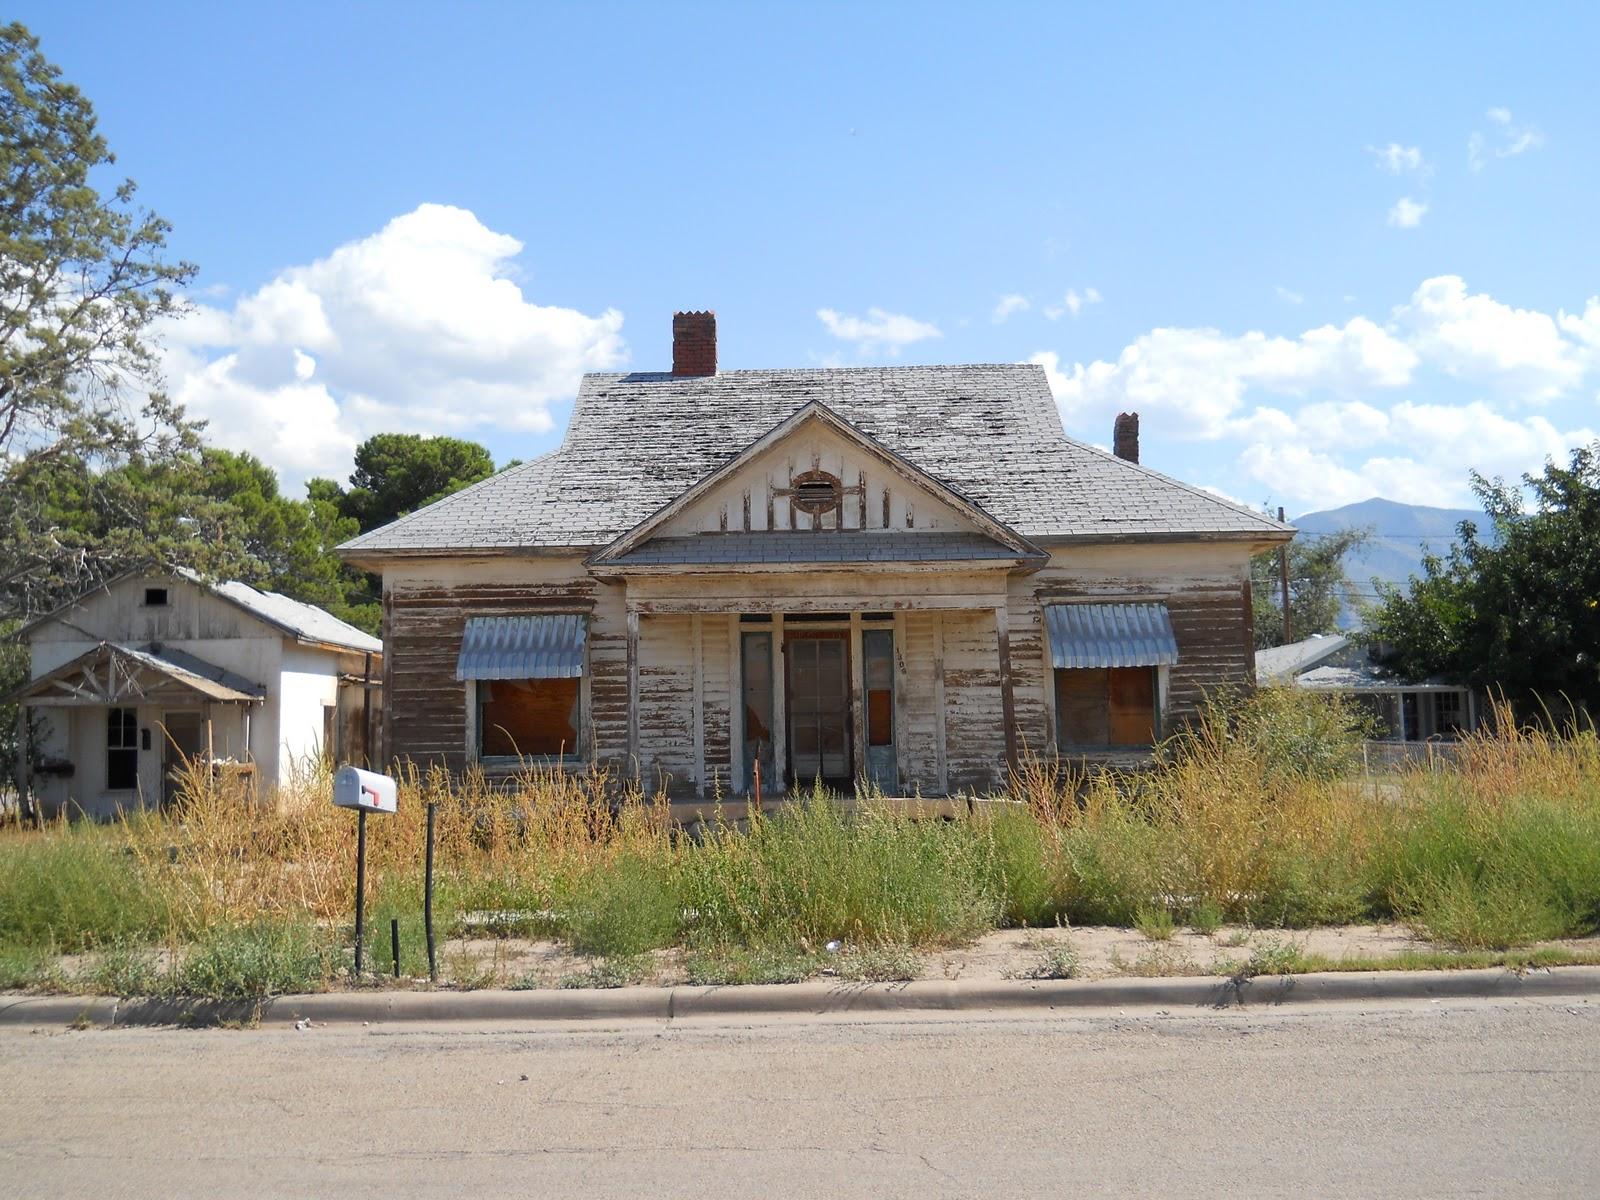 Backyard New Mexico: Some Homes of Alamogordo